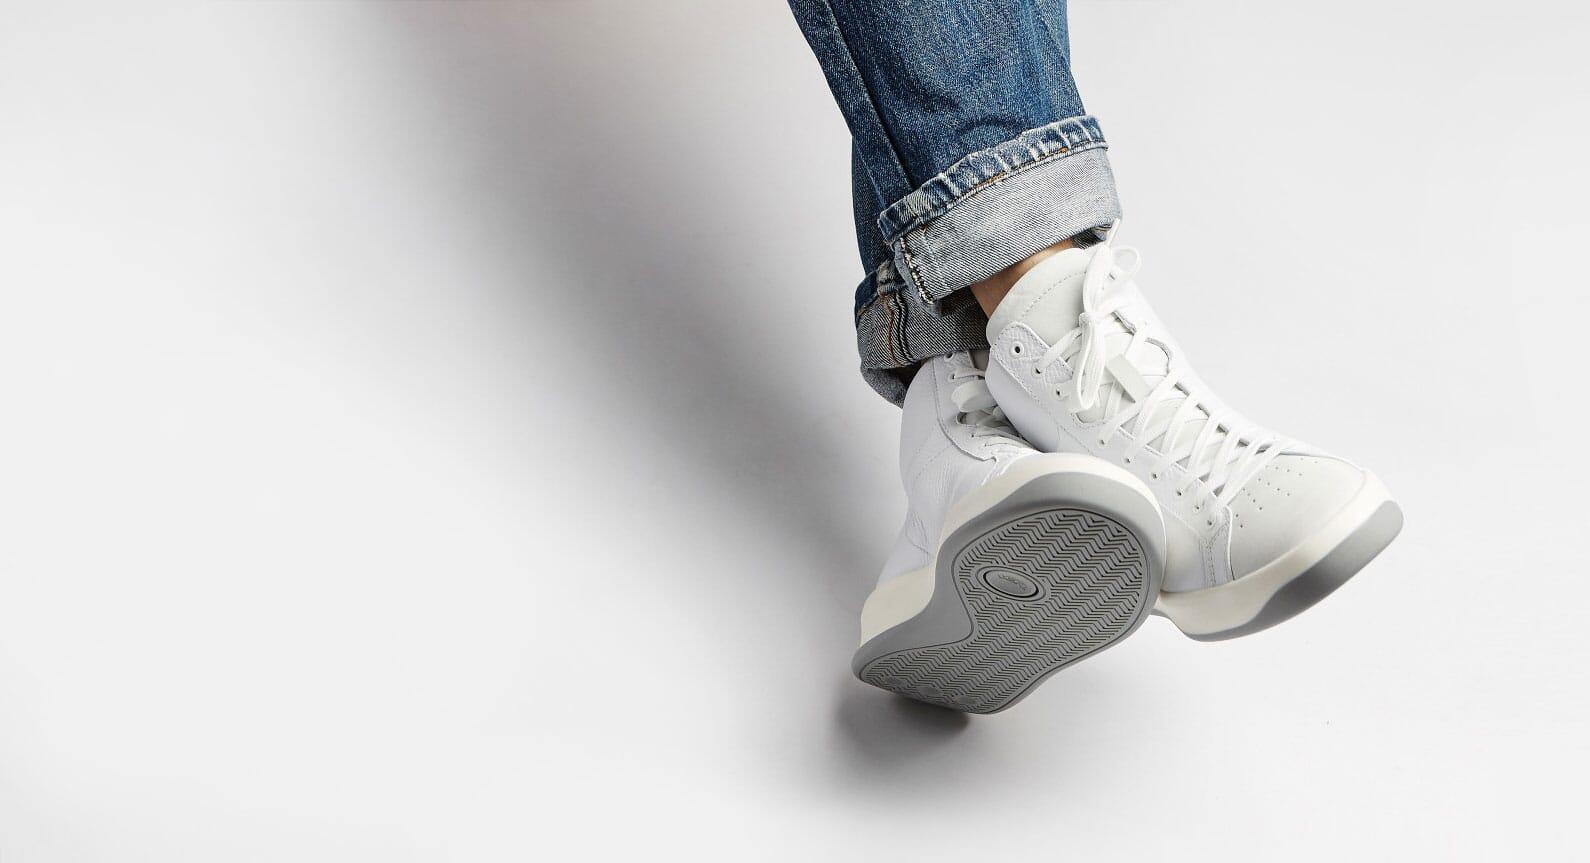 VOR Shoes Sizing Guide